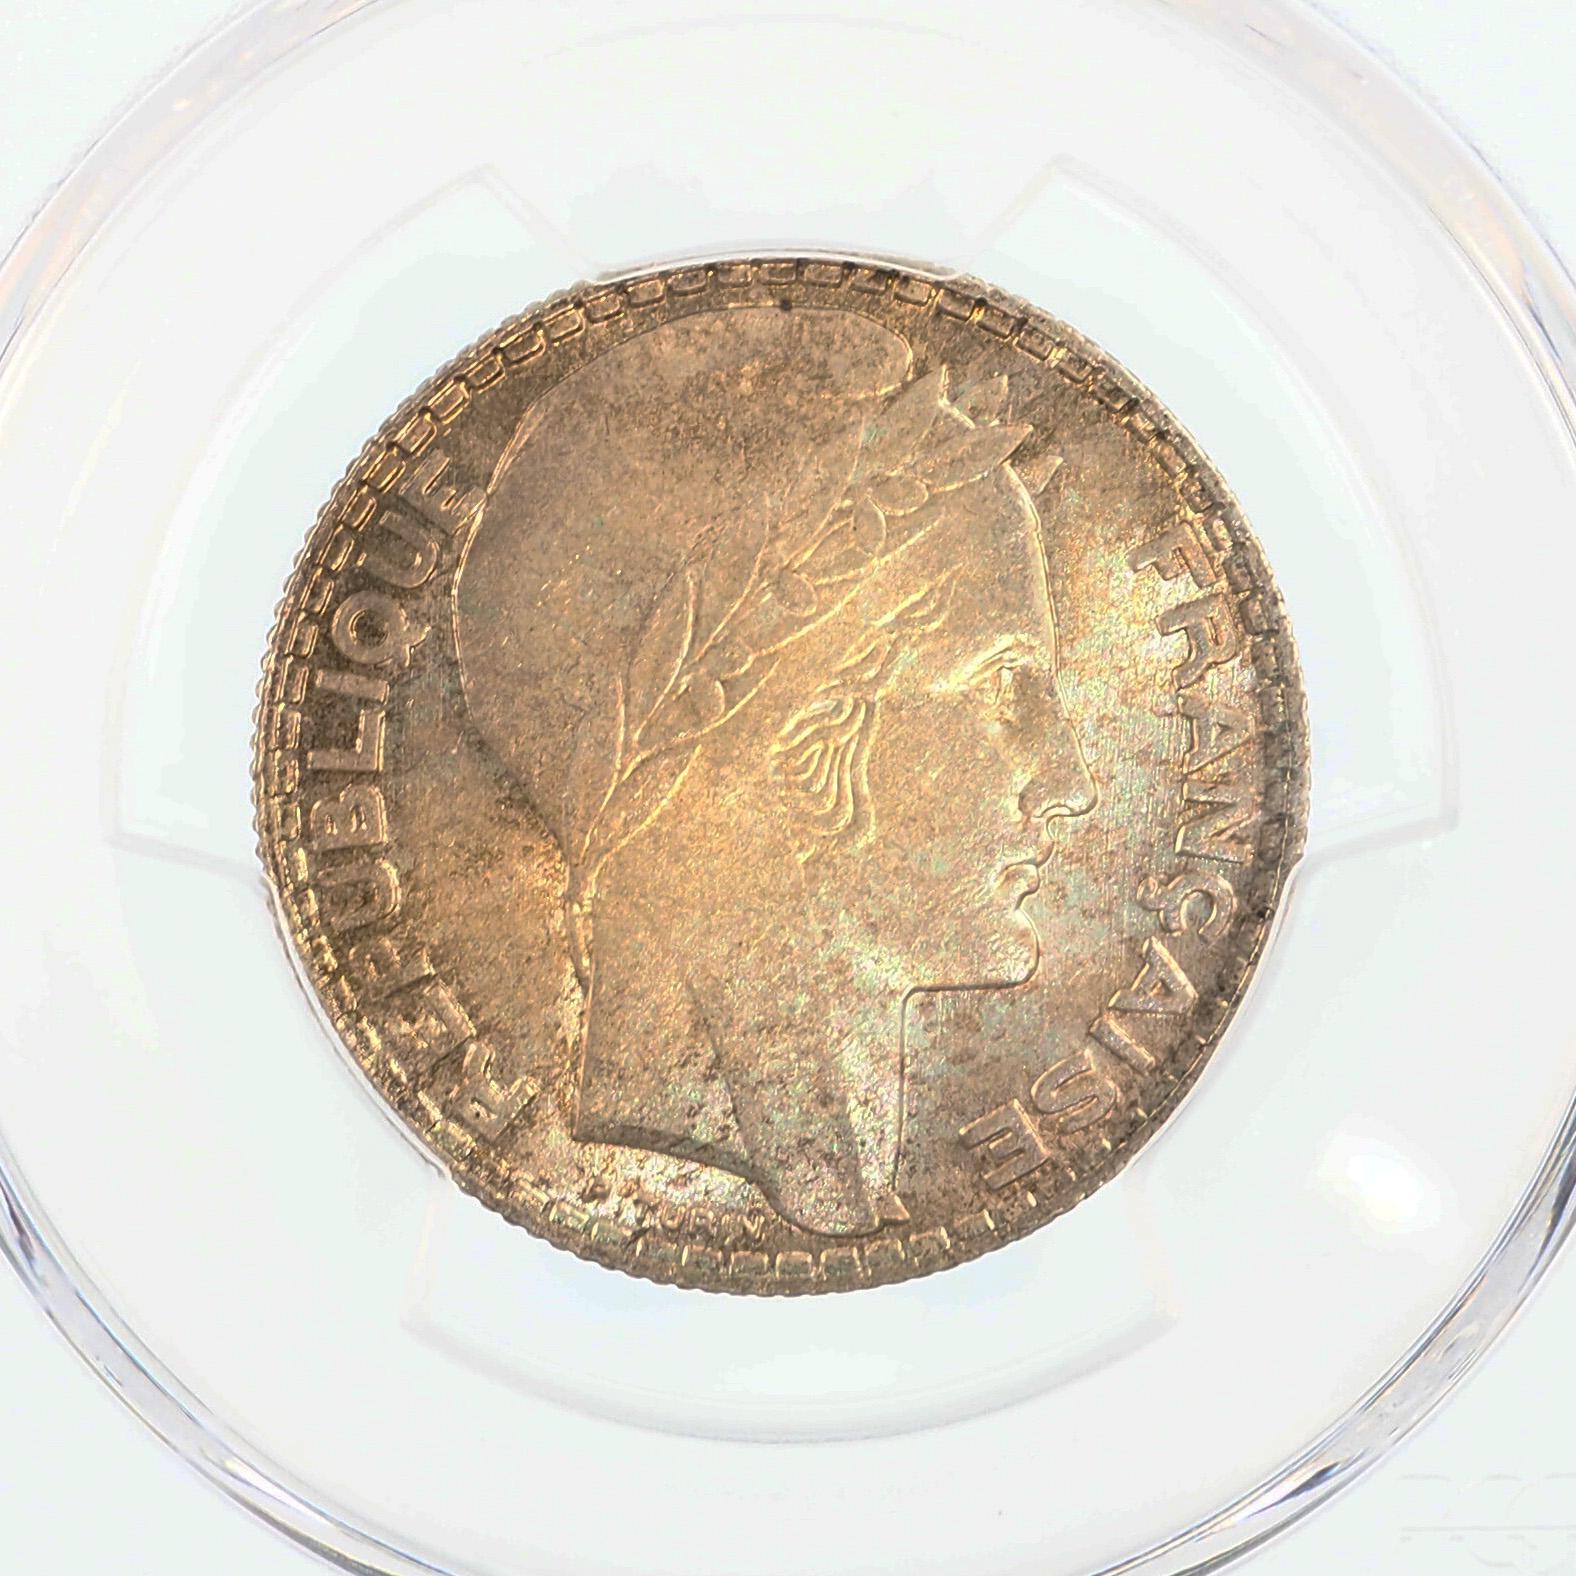 France, 10 Francs 1932, Turin, SPL+, Argent, Gad.801, PCGS MS64